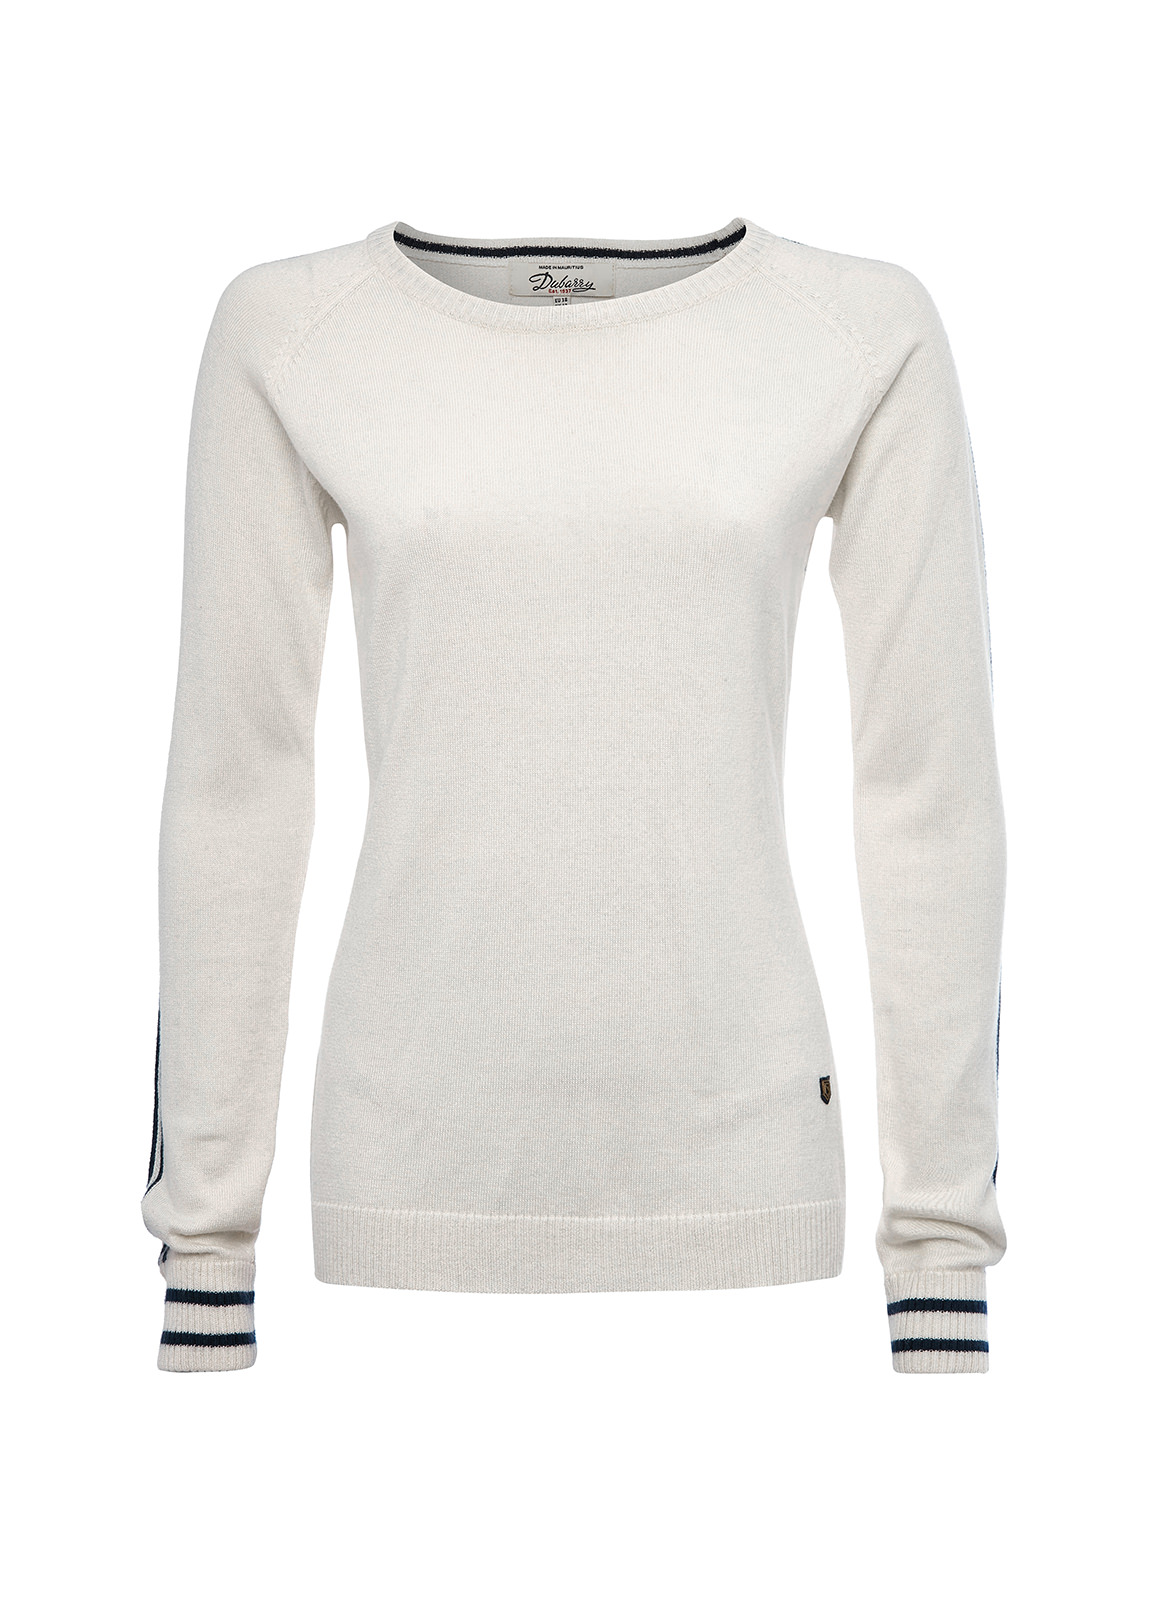 Dubarry_ Donard jumper - Sail White_Image_2